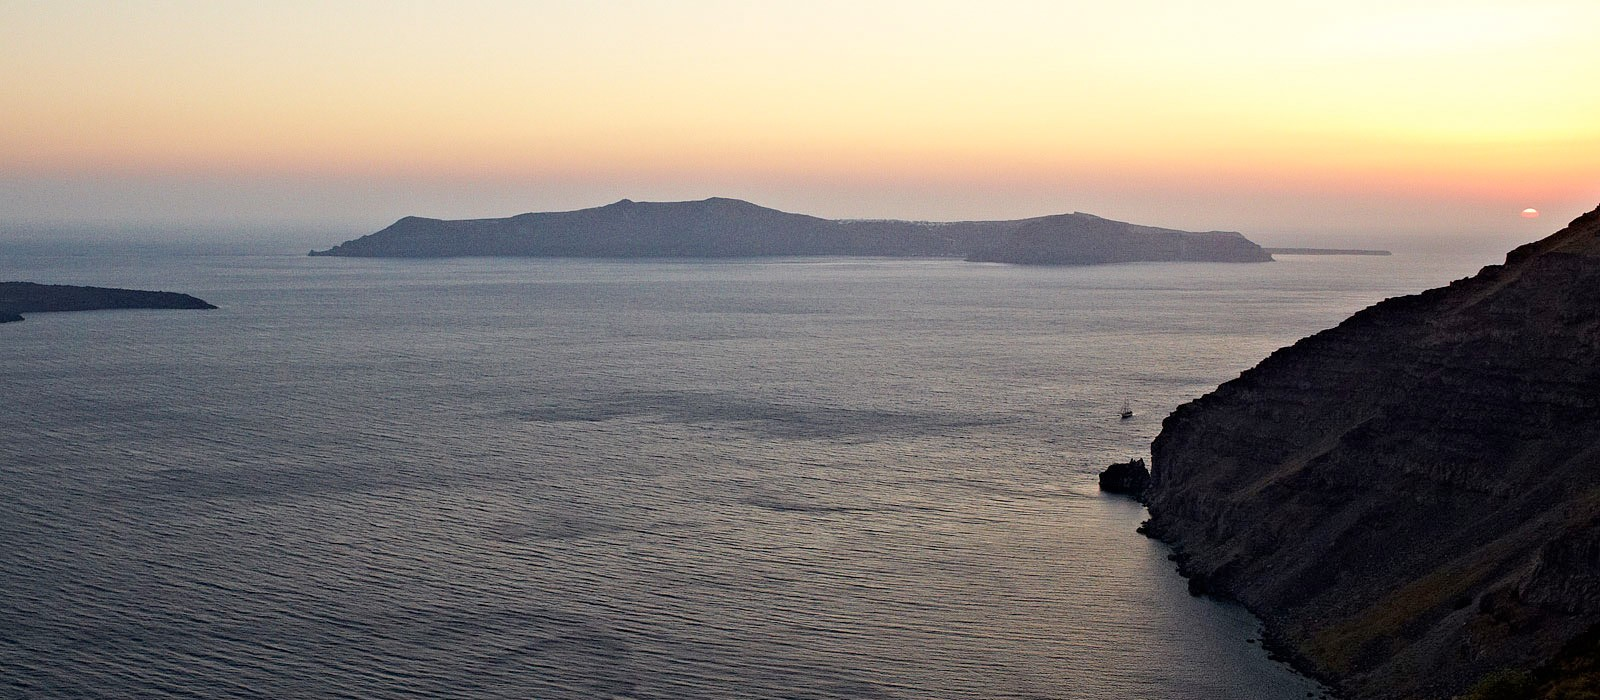 Greece holidays - sun rocks santorini - header